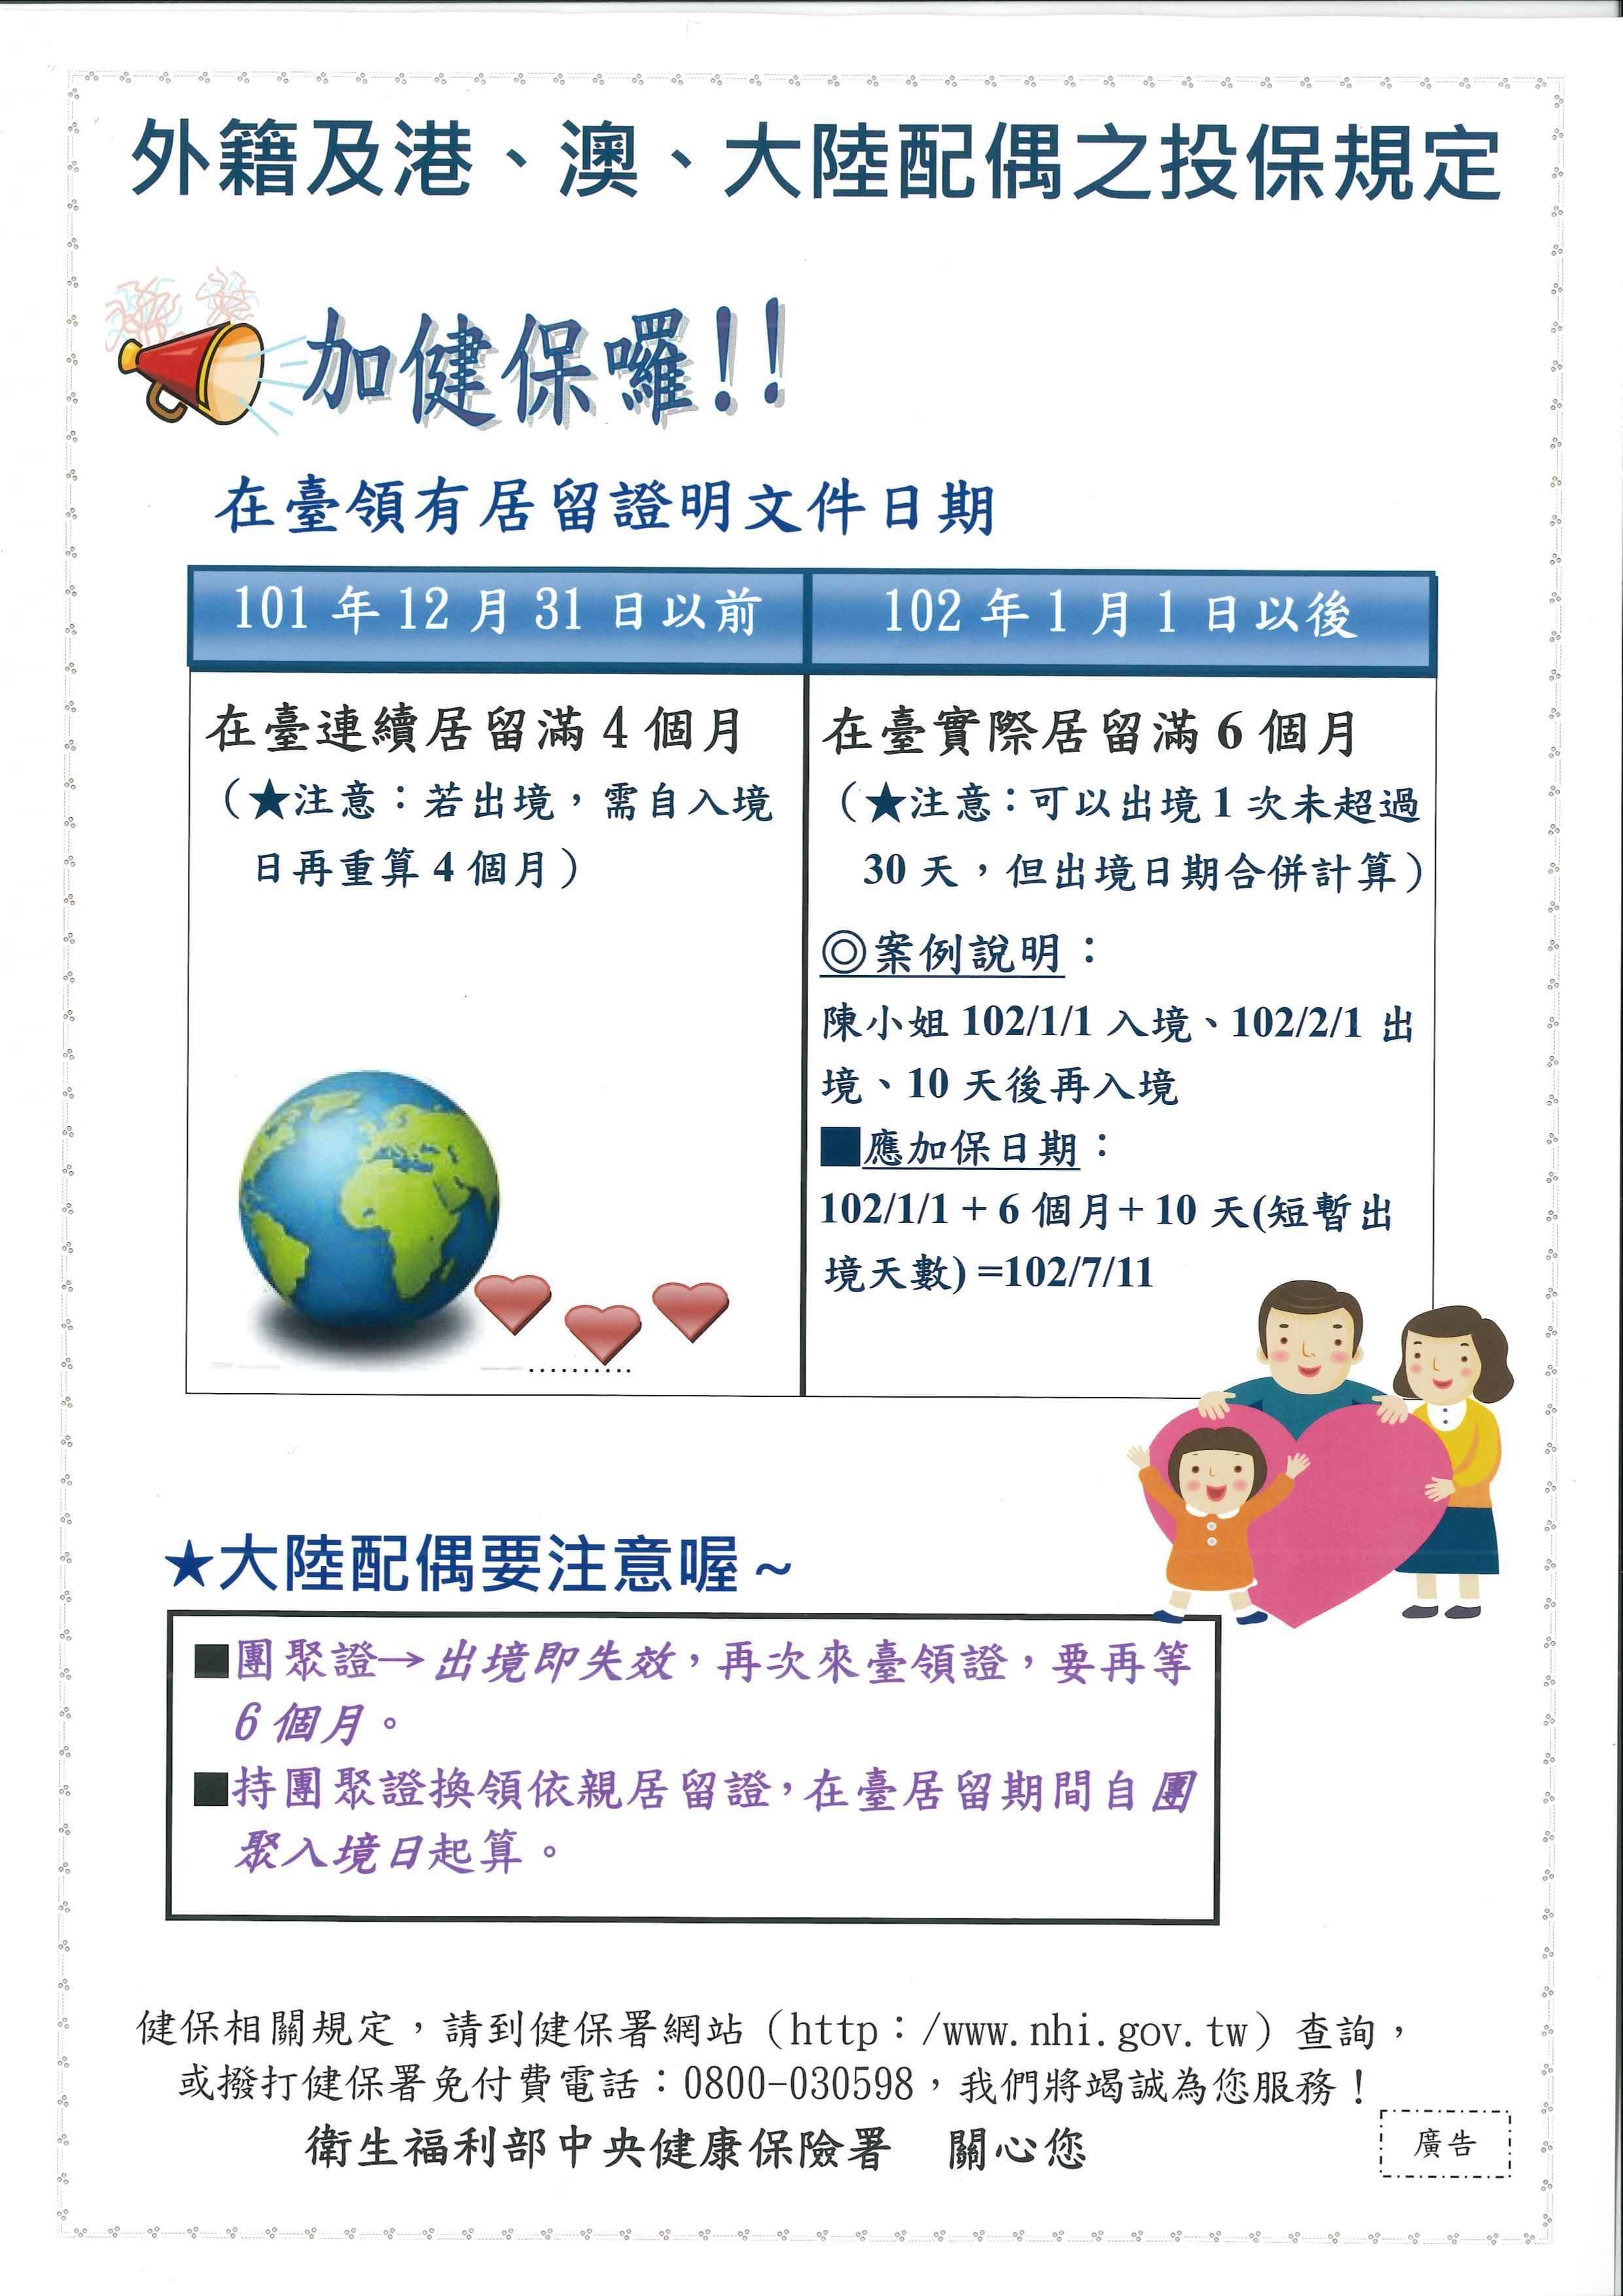 proimages/外籍停復健保行動居家app1.jpg